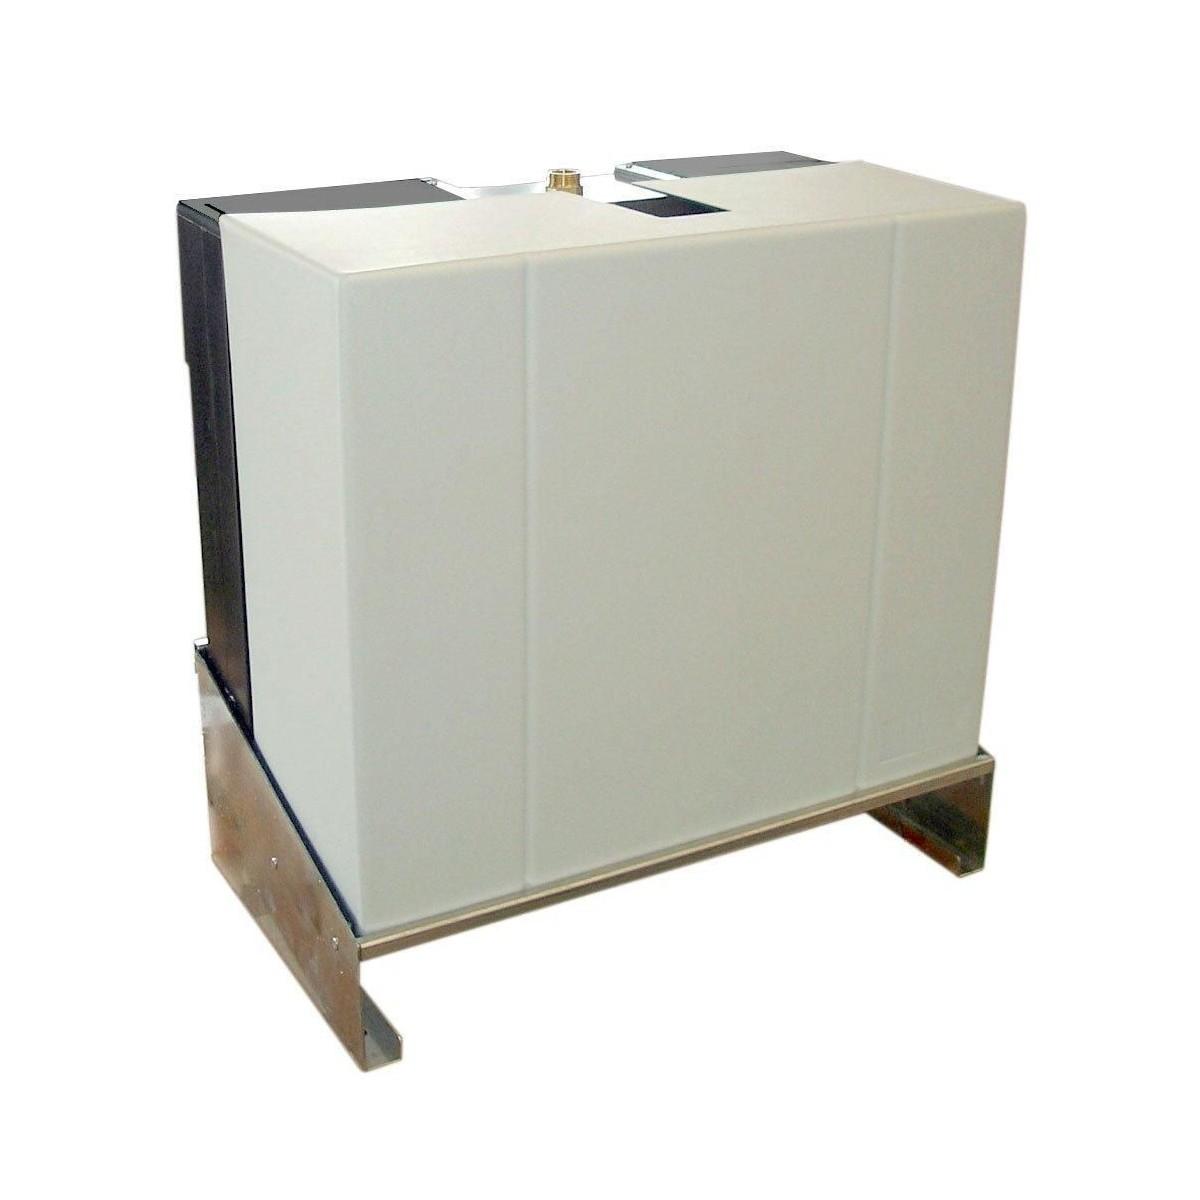 Aquamatic Domestic Euroinox 40/80